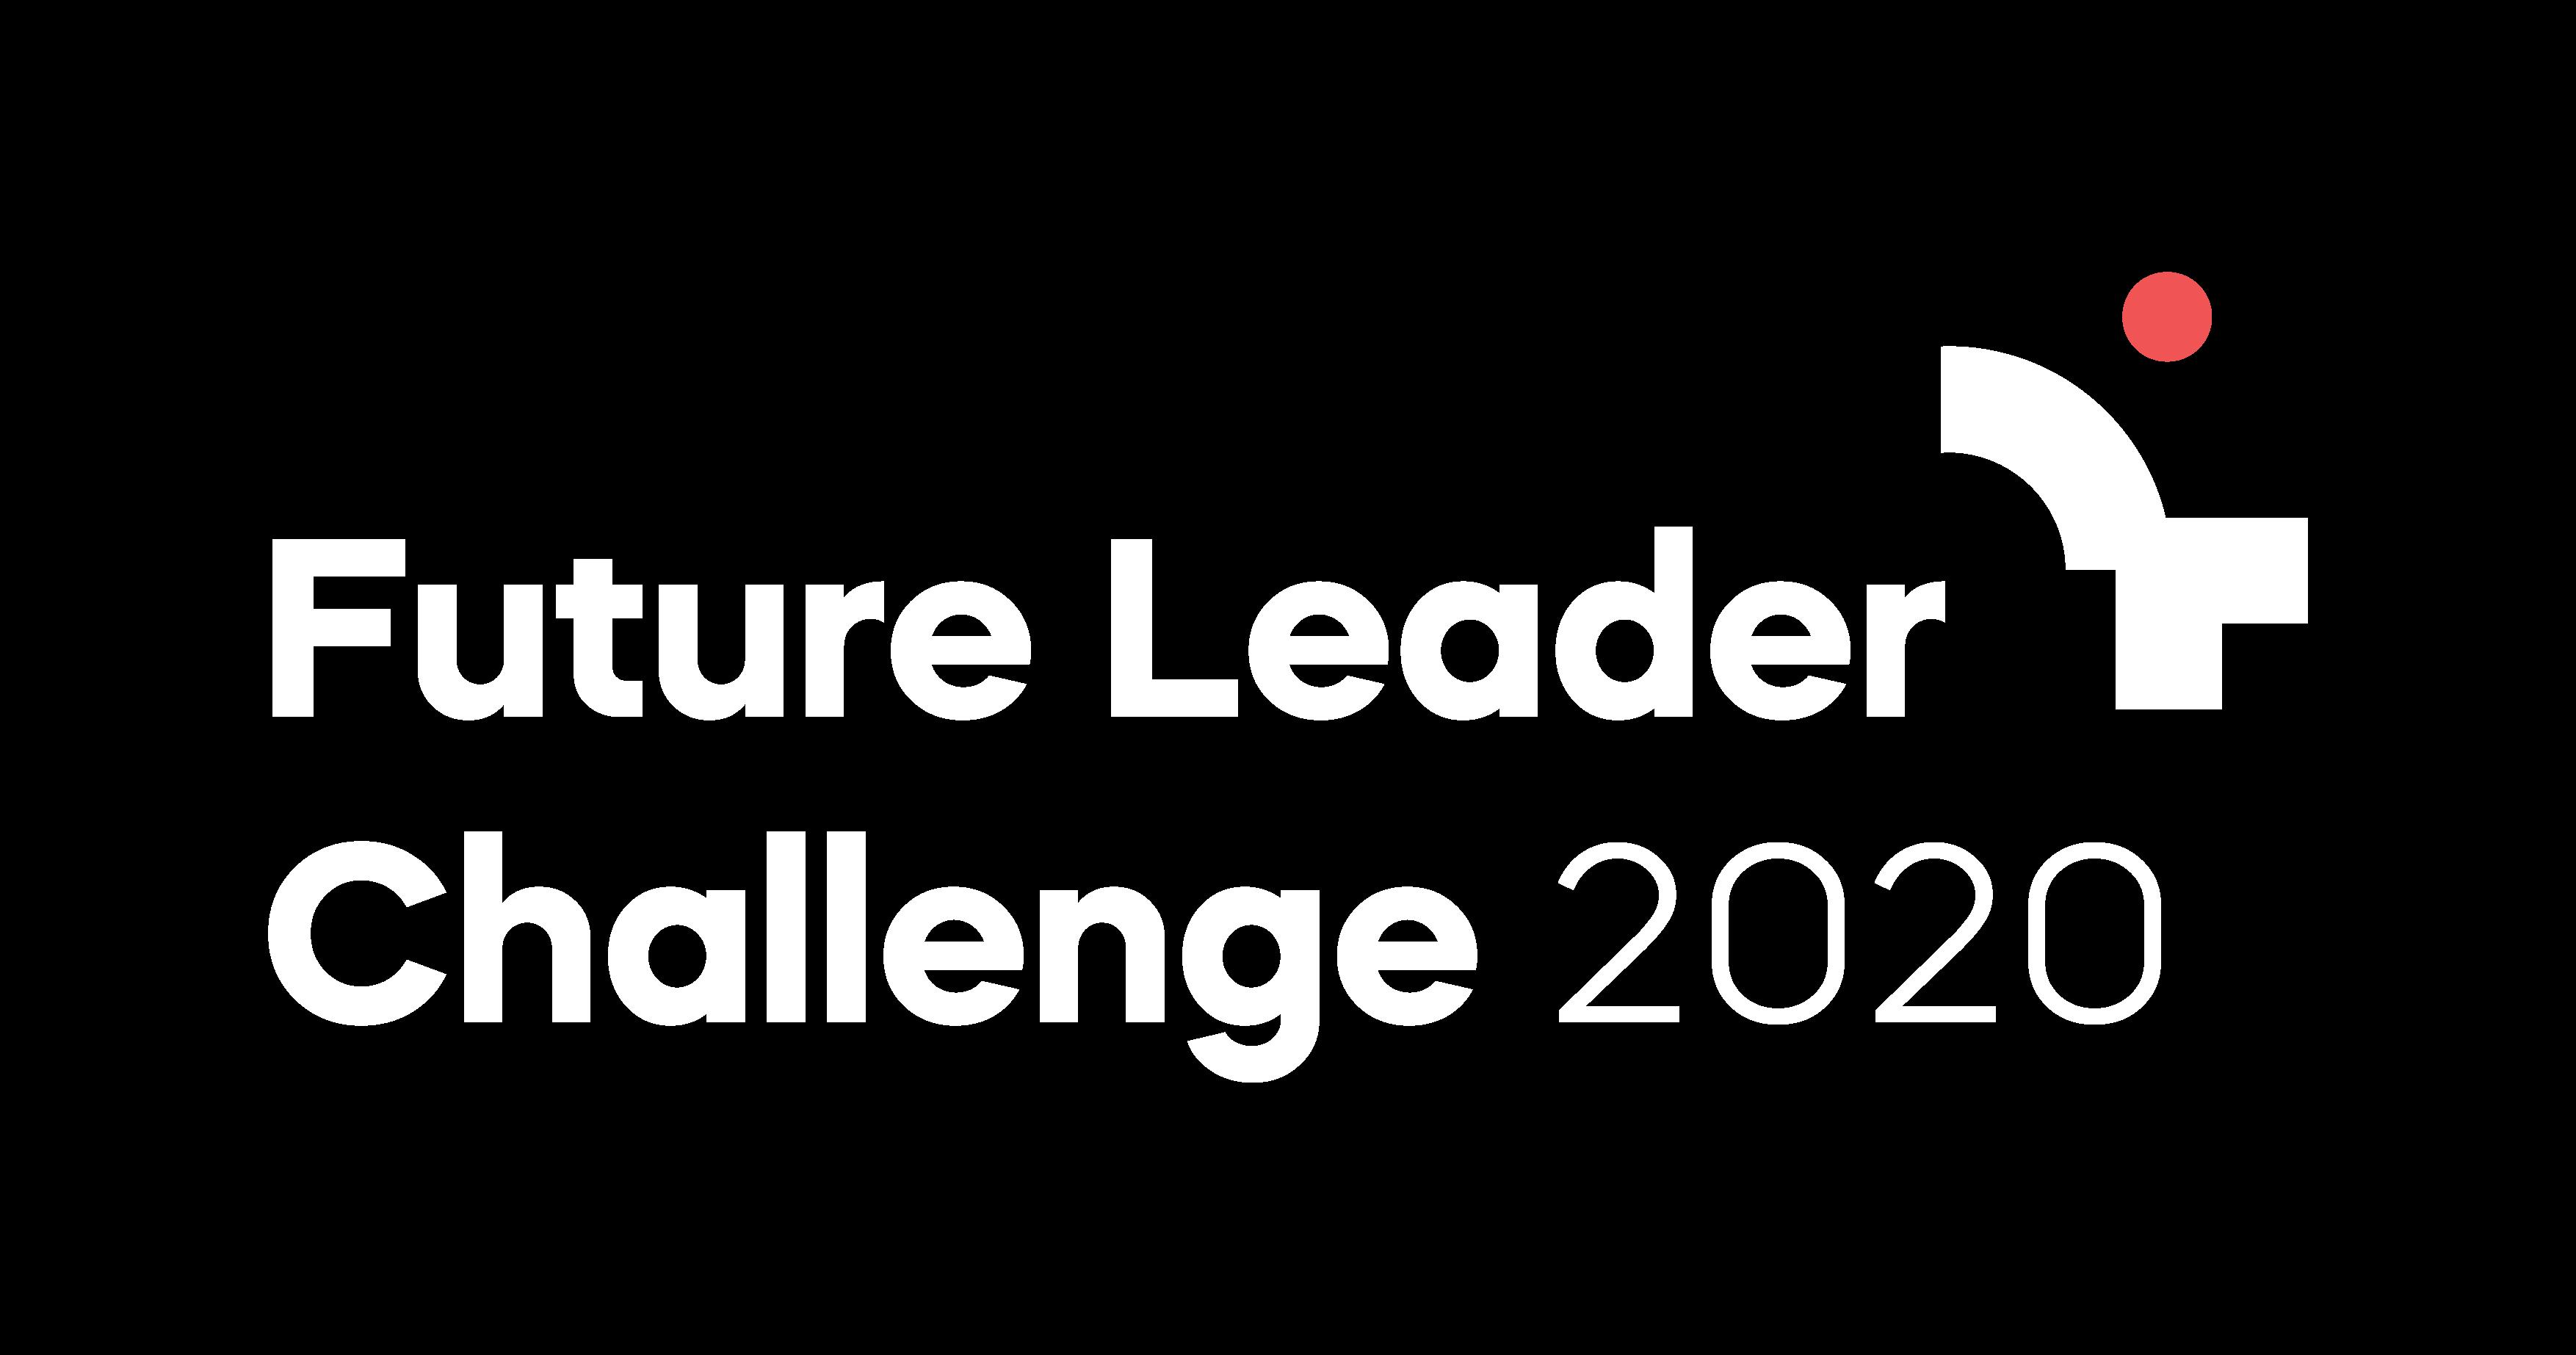 Future Leader Challenge